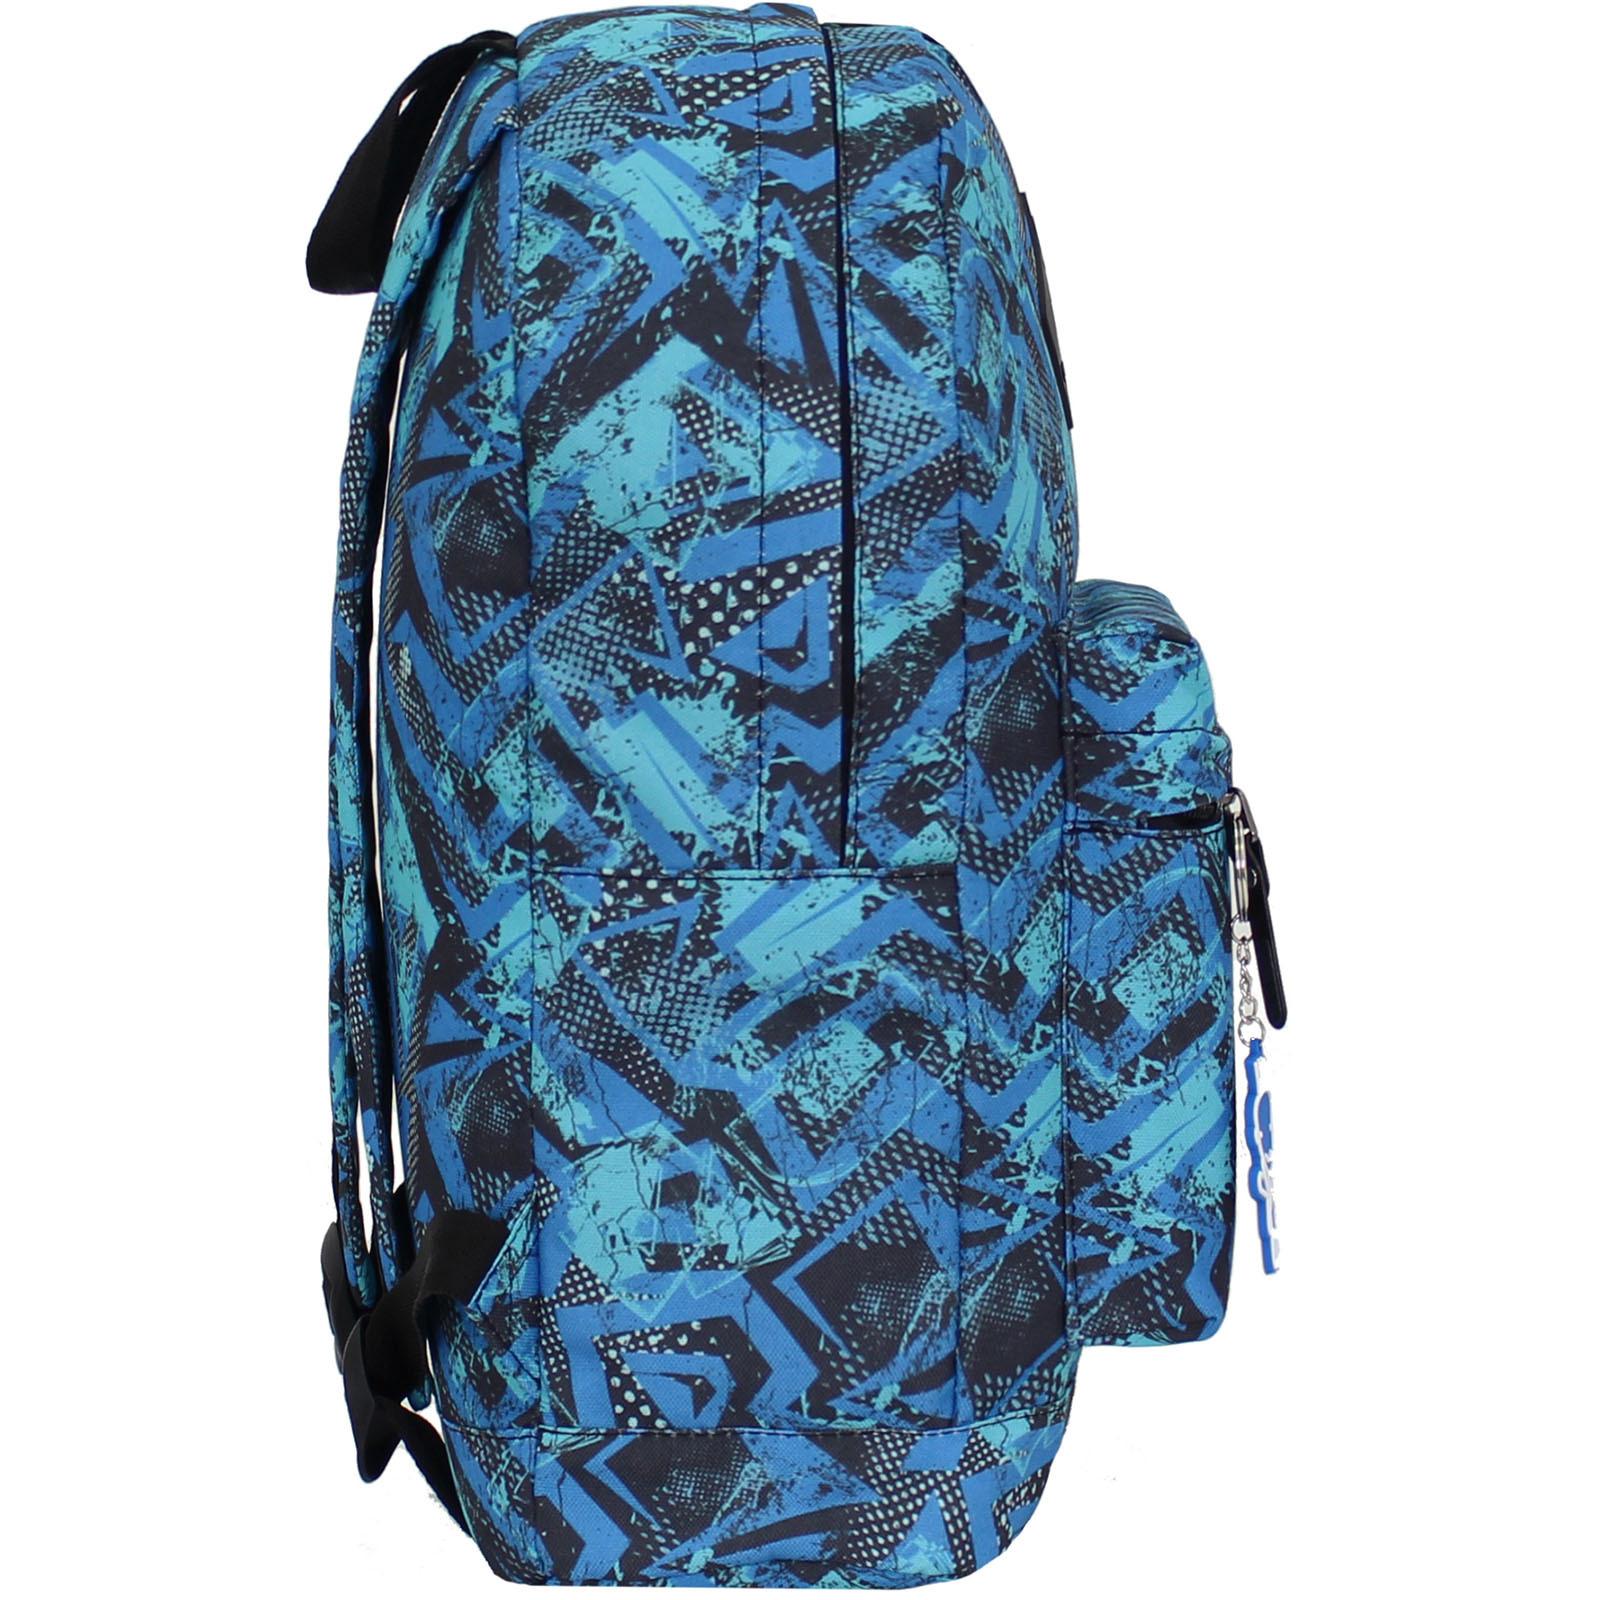 Рюкзак Bagland Молодежный (дизайн) 17 л. сублимация 212 (00533664)